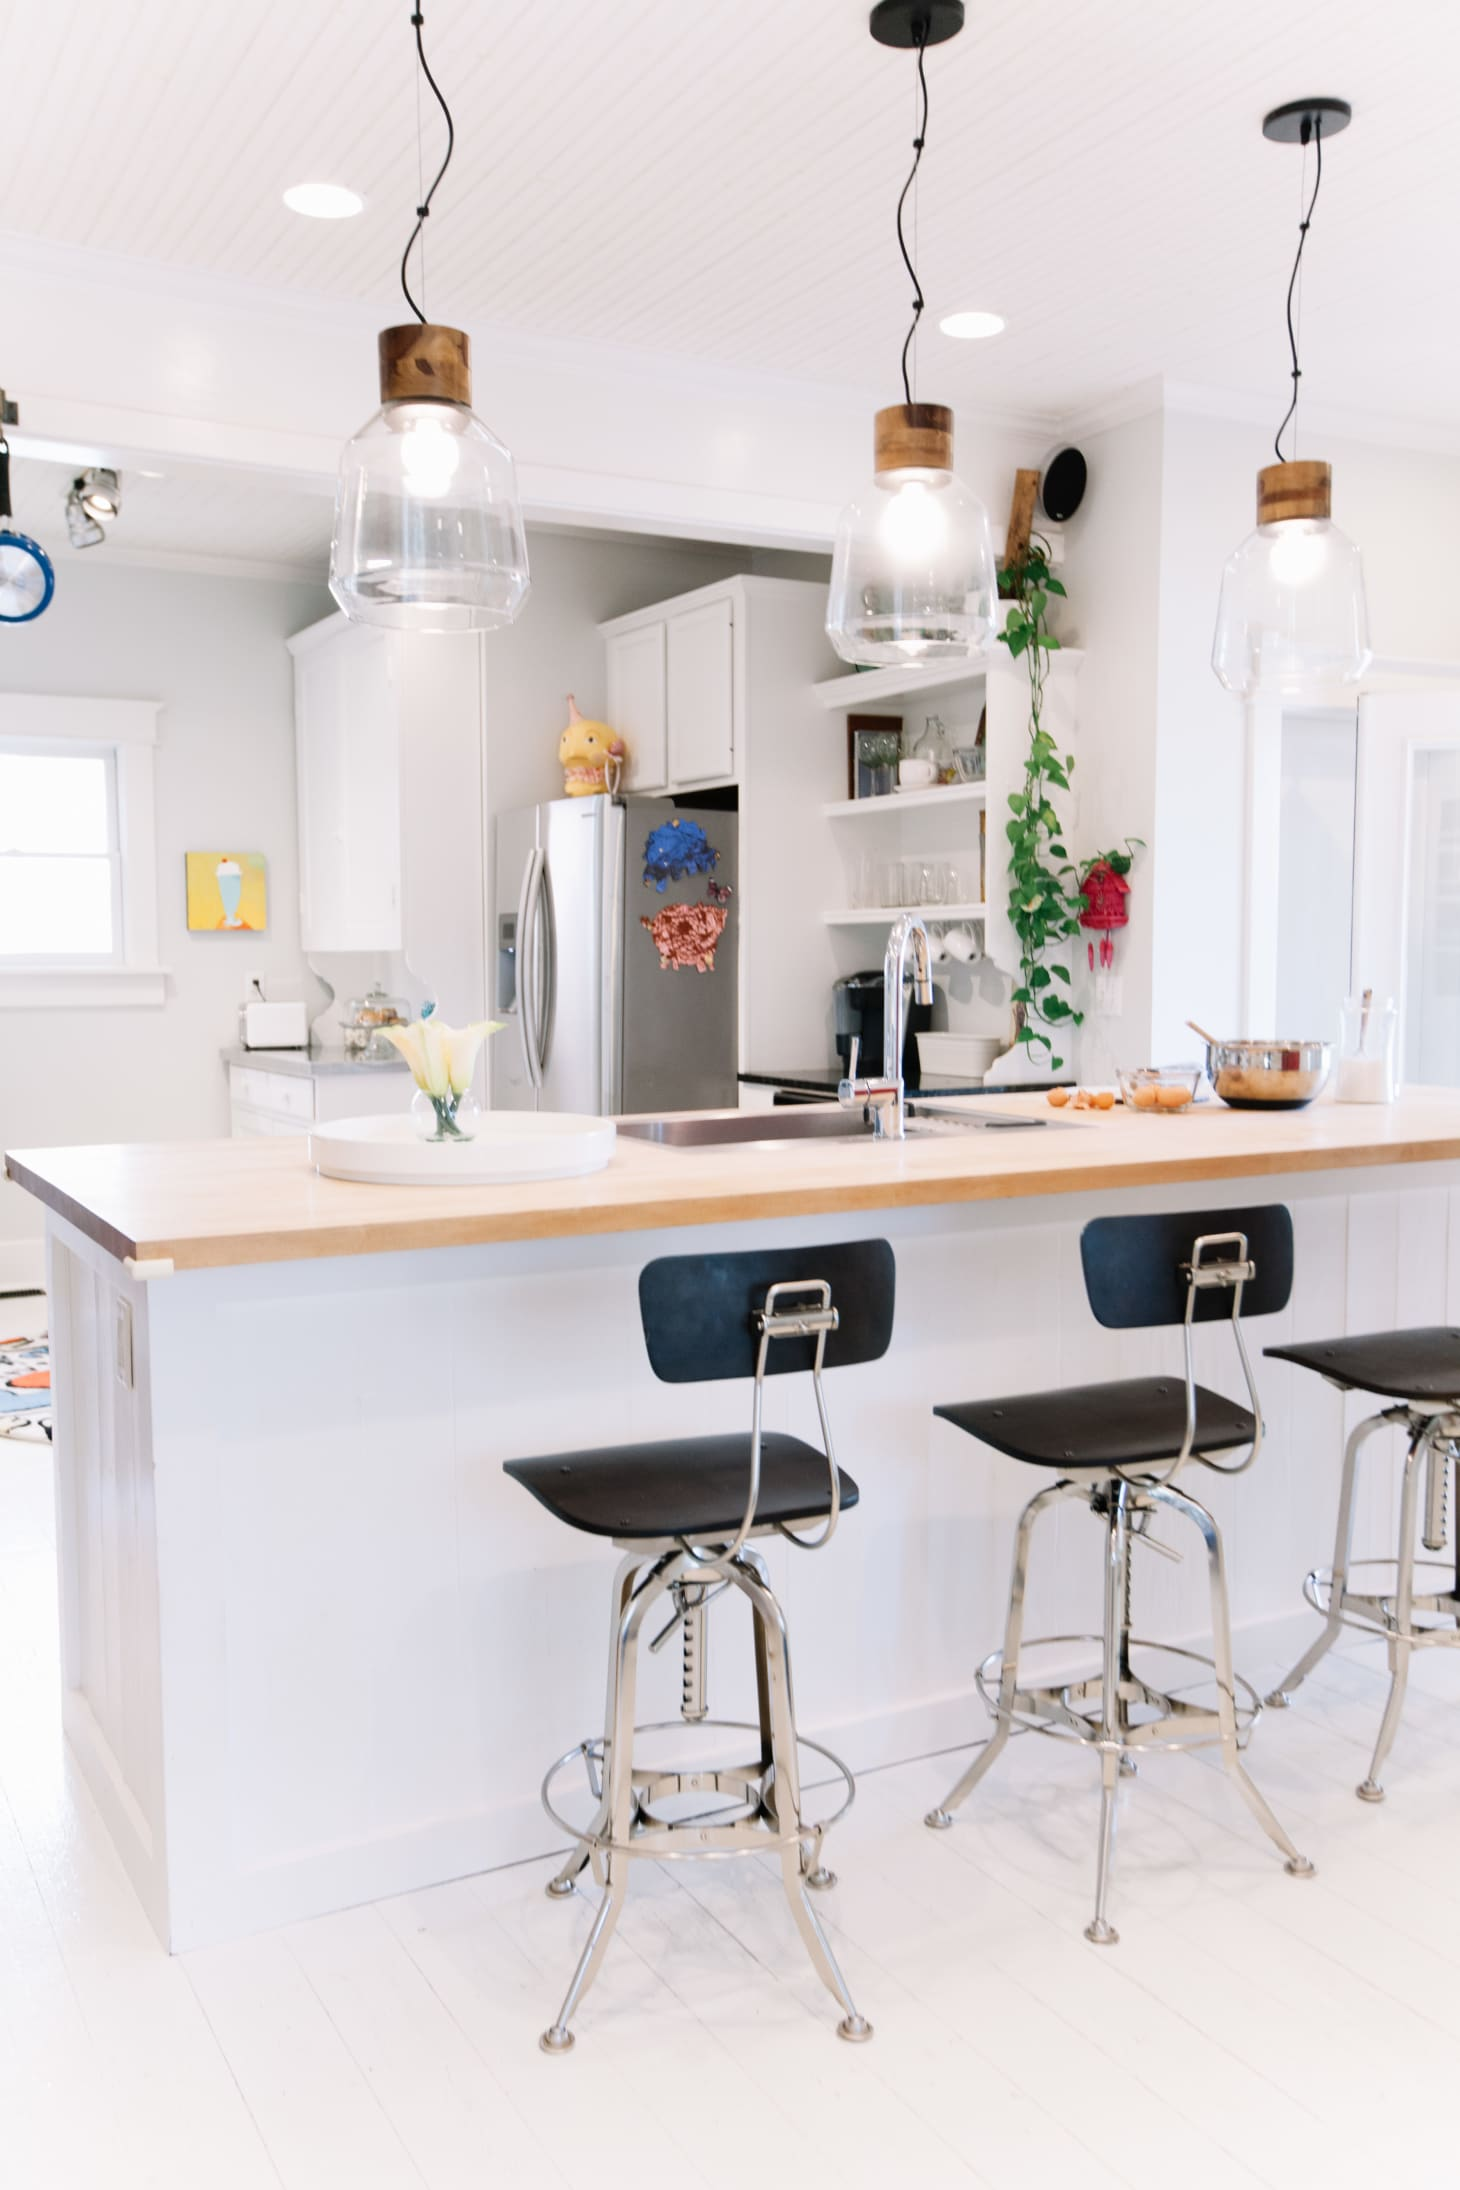 Gallery Of Kitchen Island Breakfast Bar Ideas Inspiration